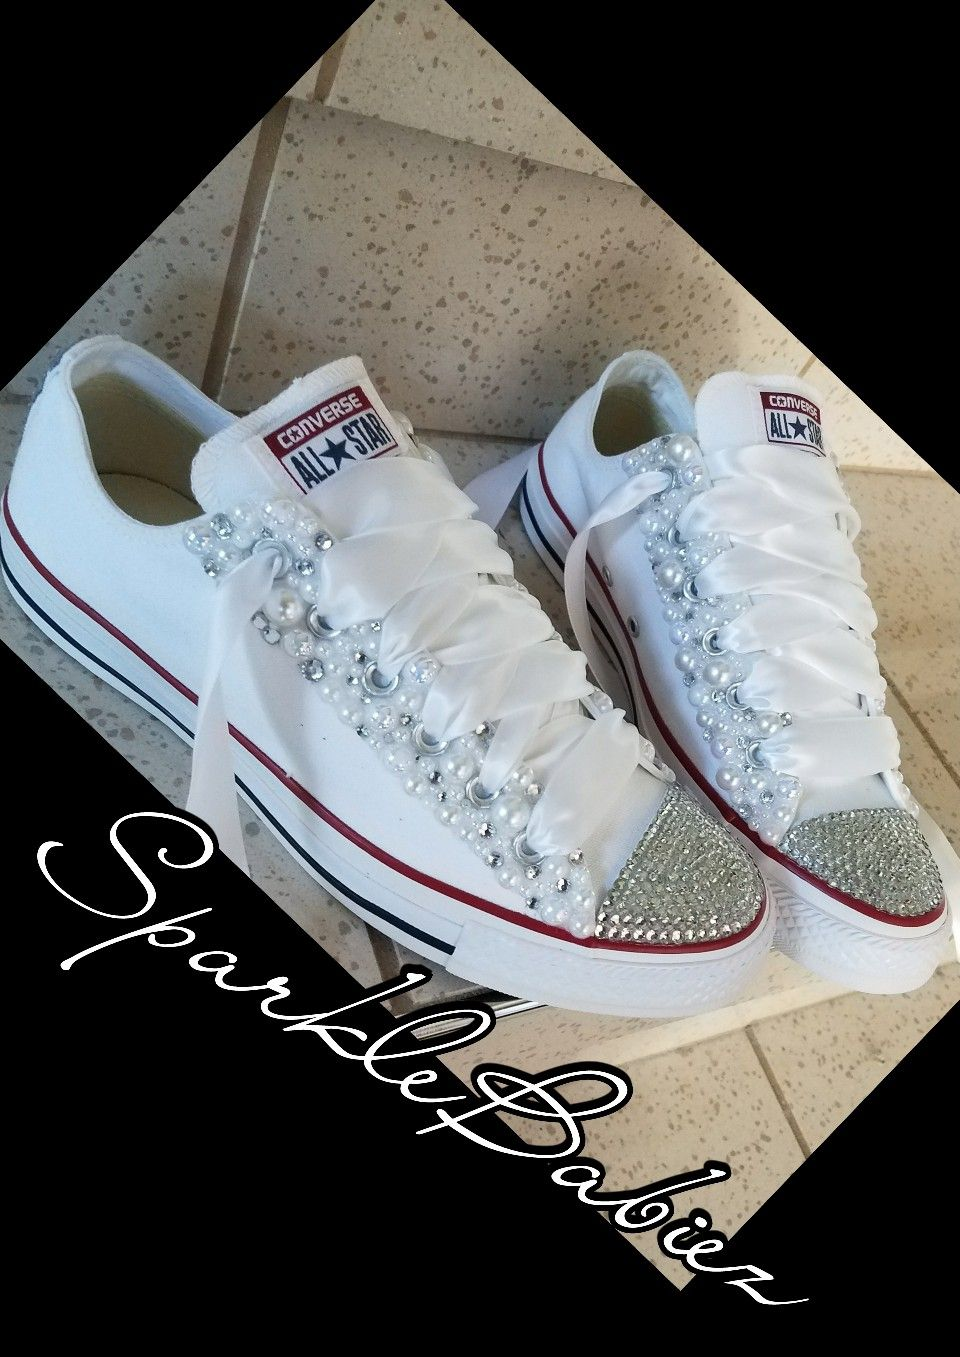 Bling & Pearl Chuck Taylor All Star Converse Wedding Bridal Shoes